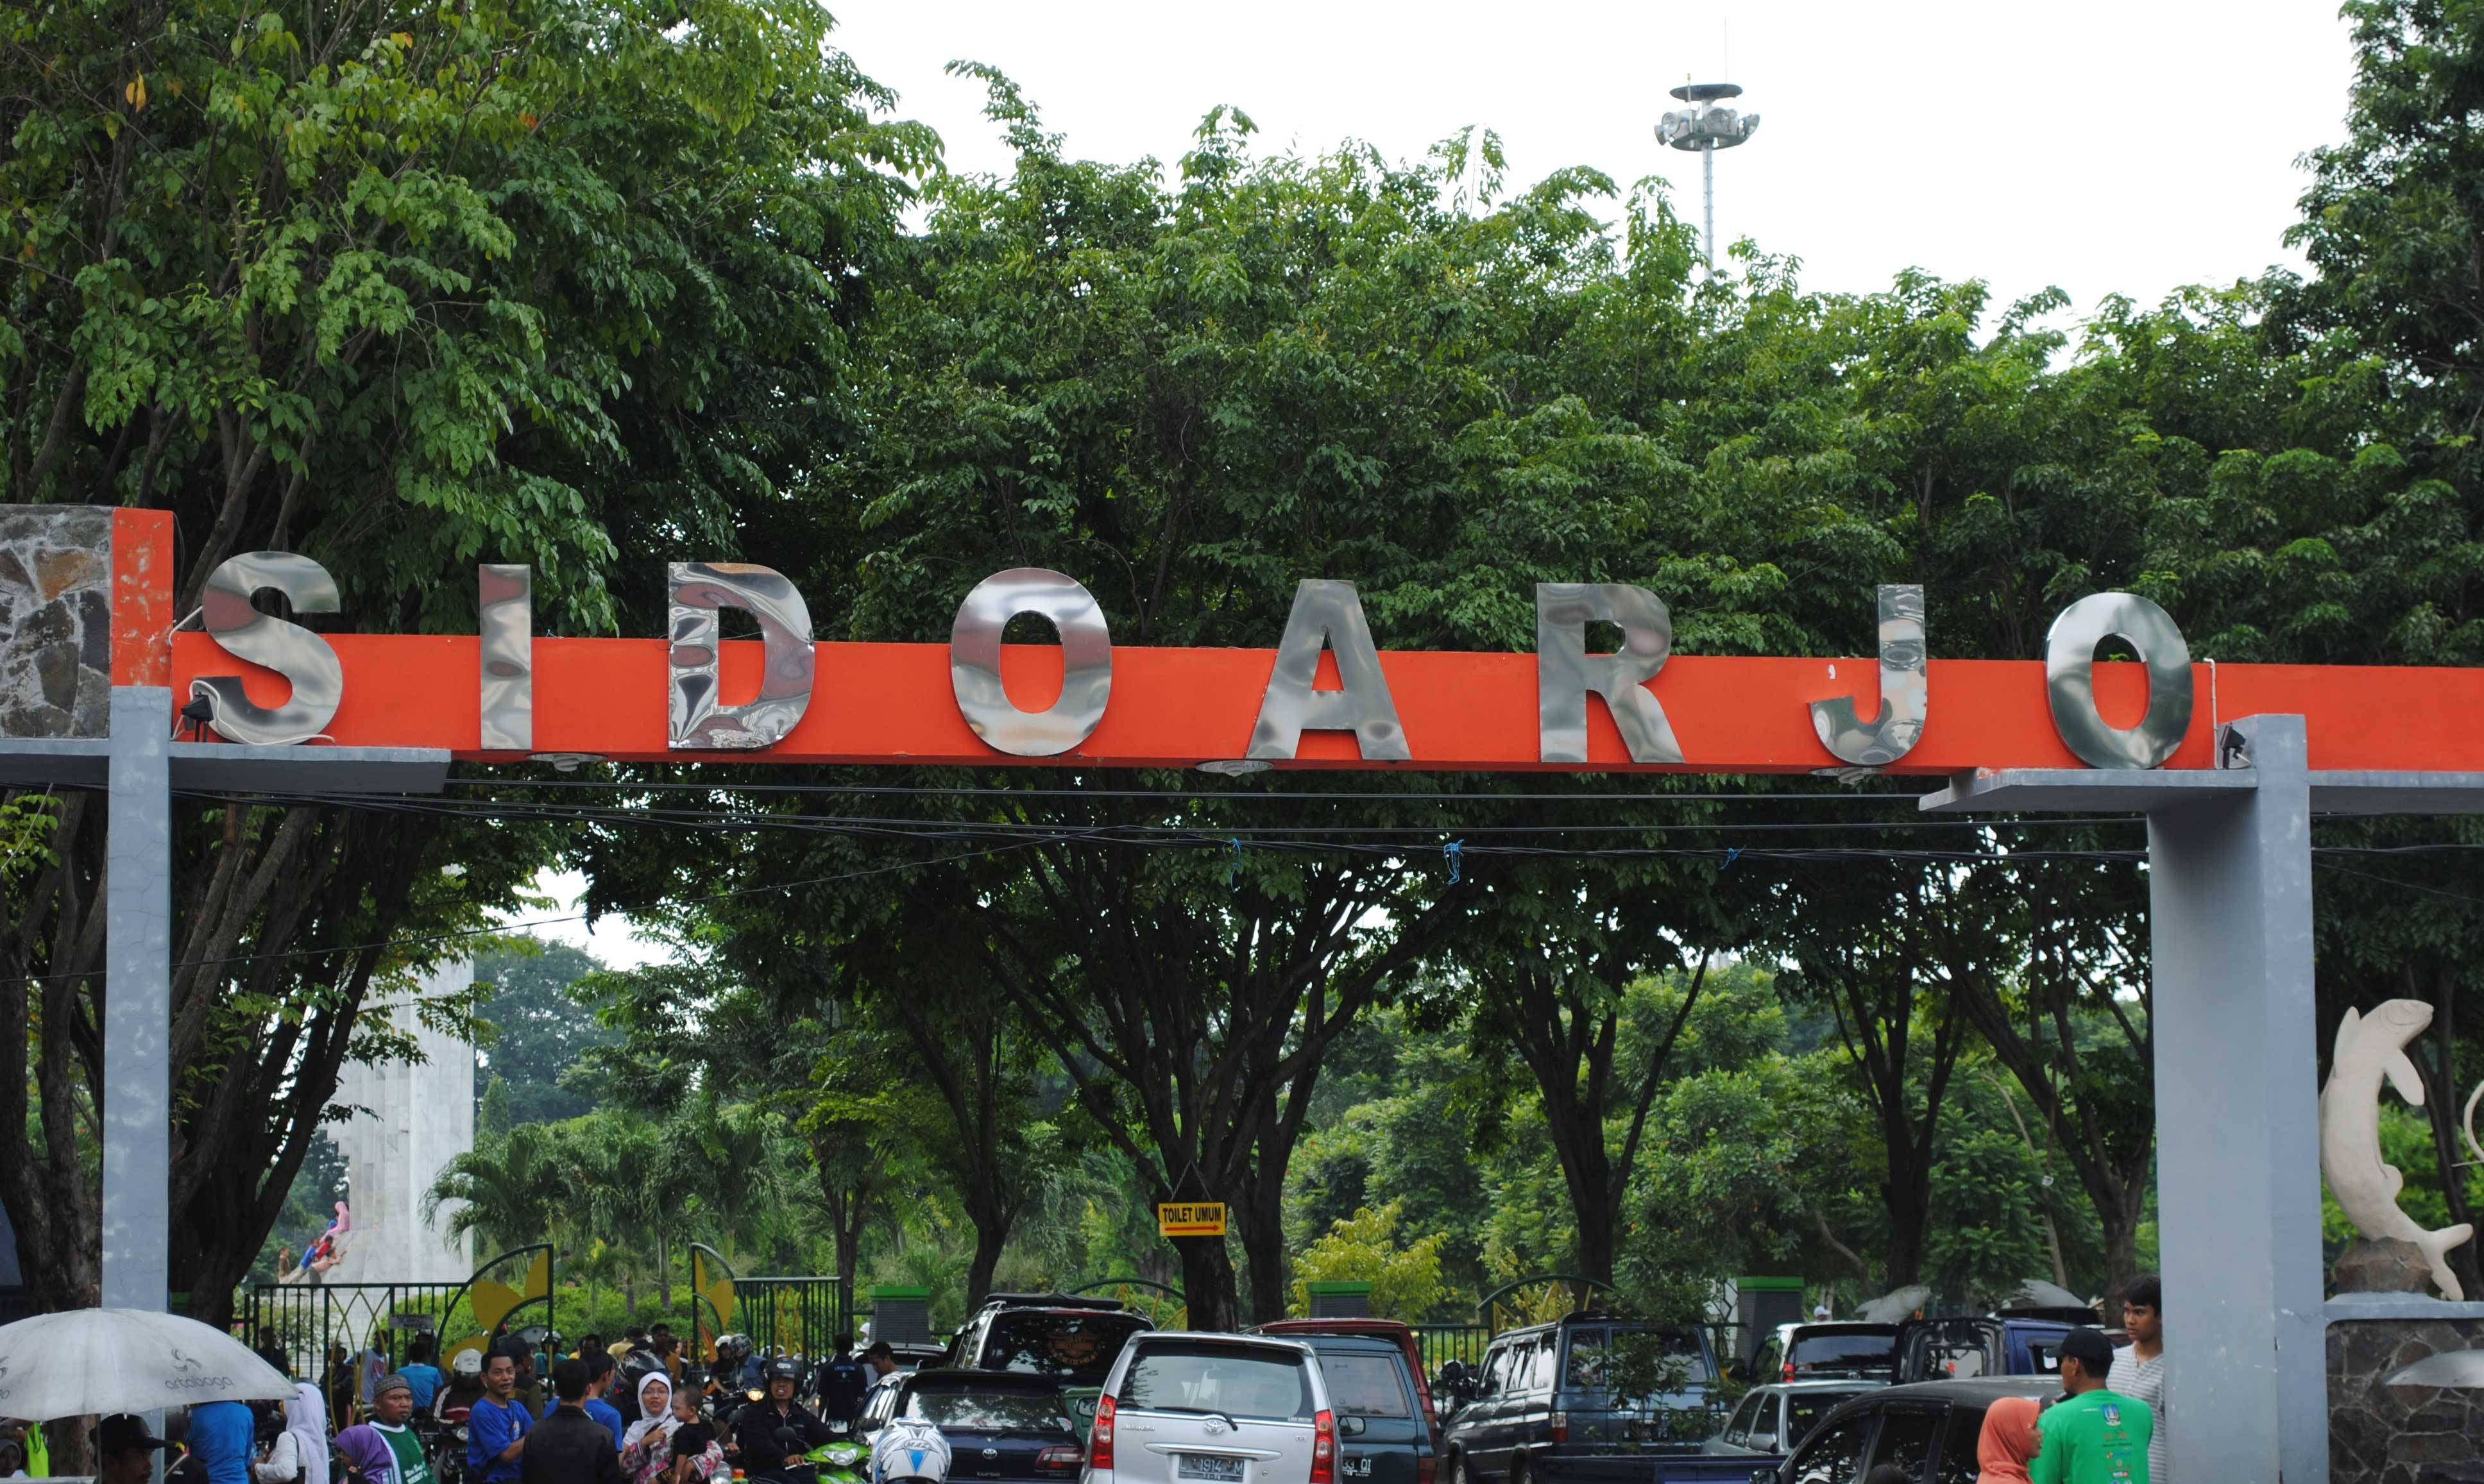 Hotel Murah Pusat Kota Sidoarjo Wisata Candi Pari Kab